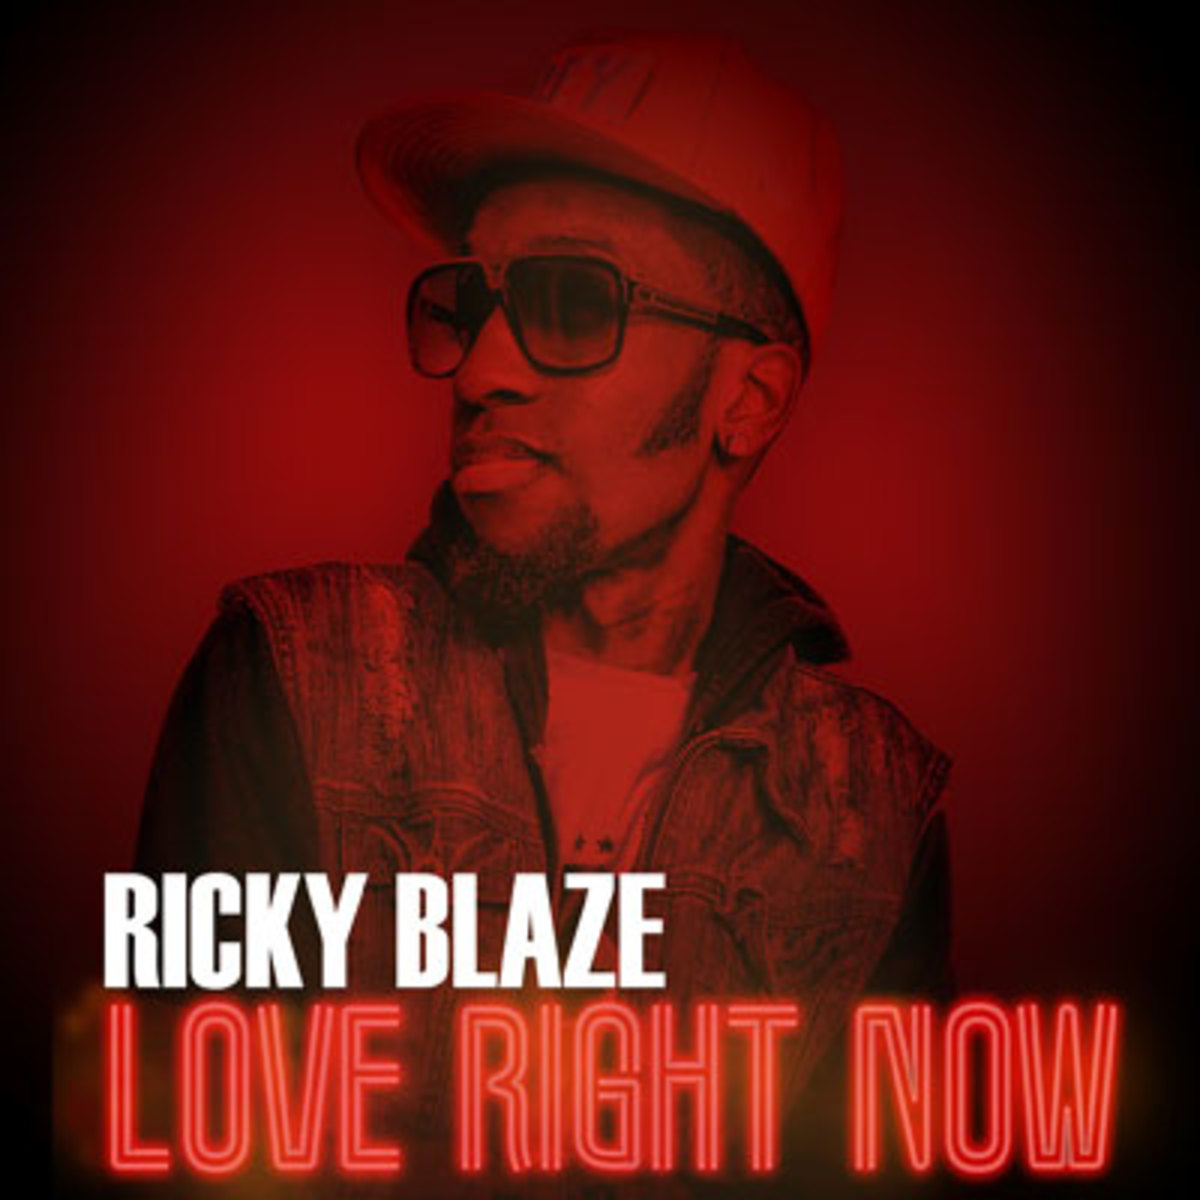 rickyblaze-loverightnow.jpg